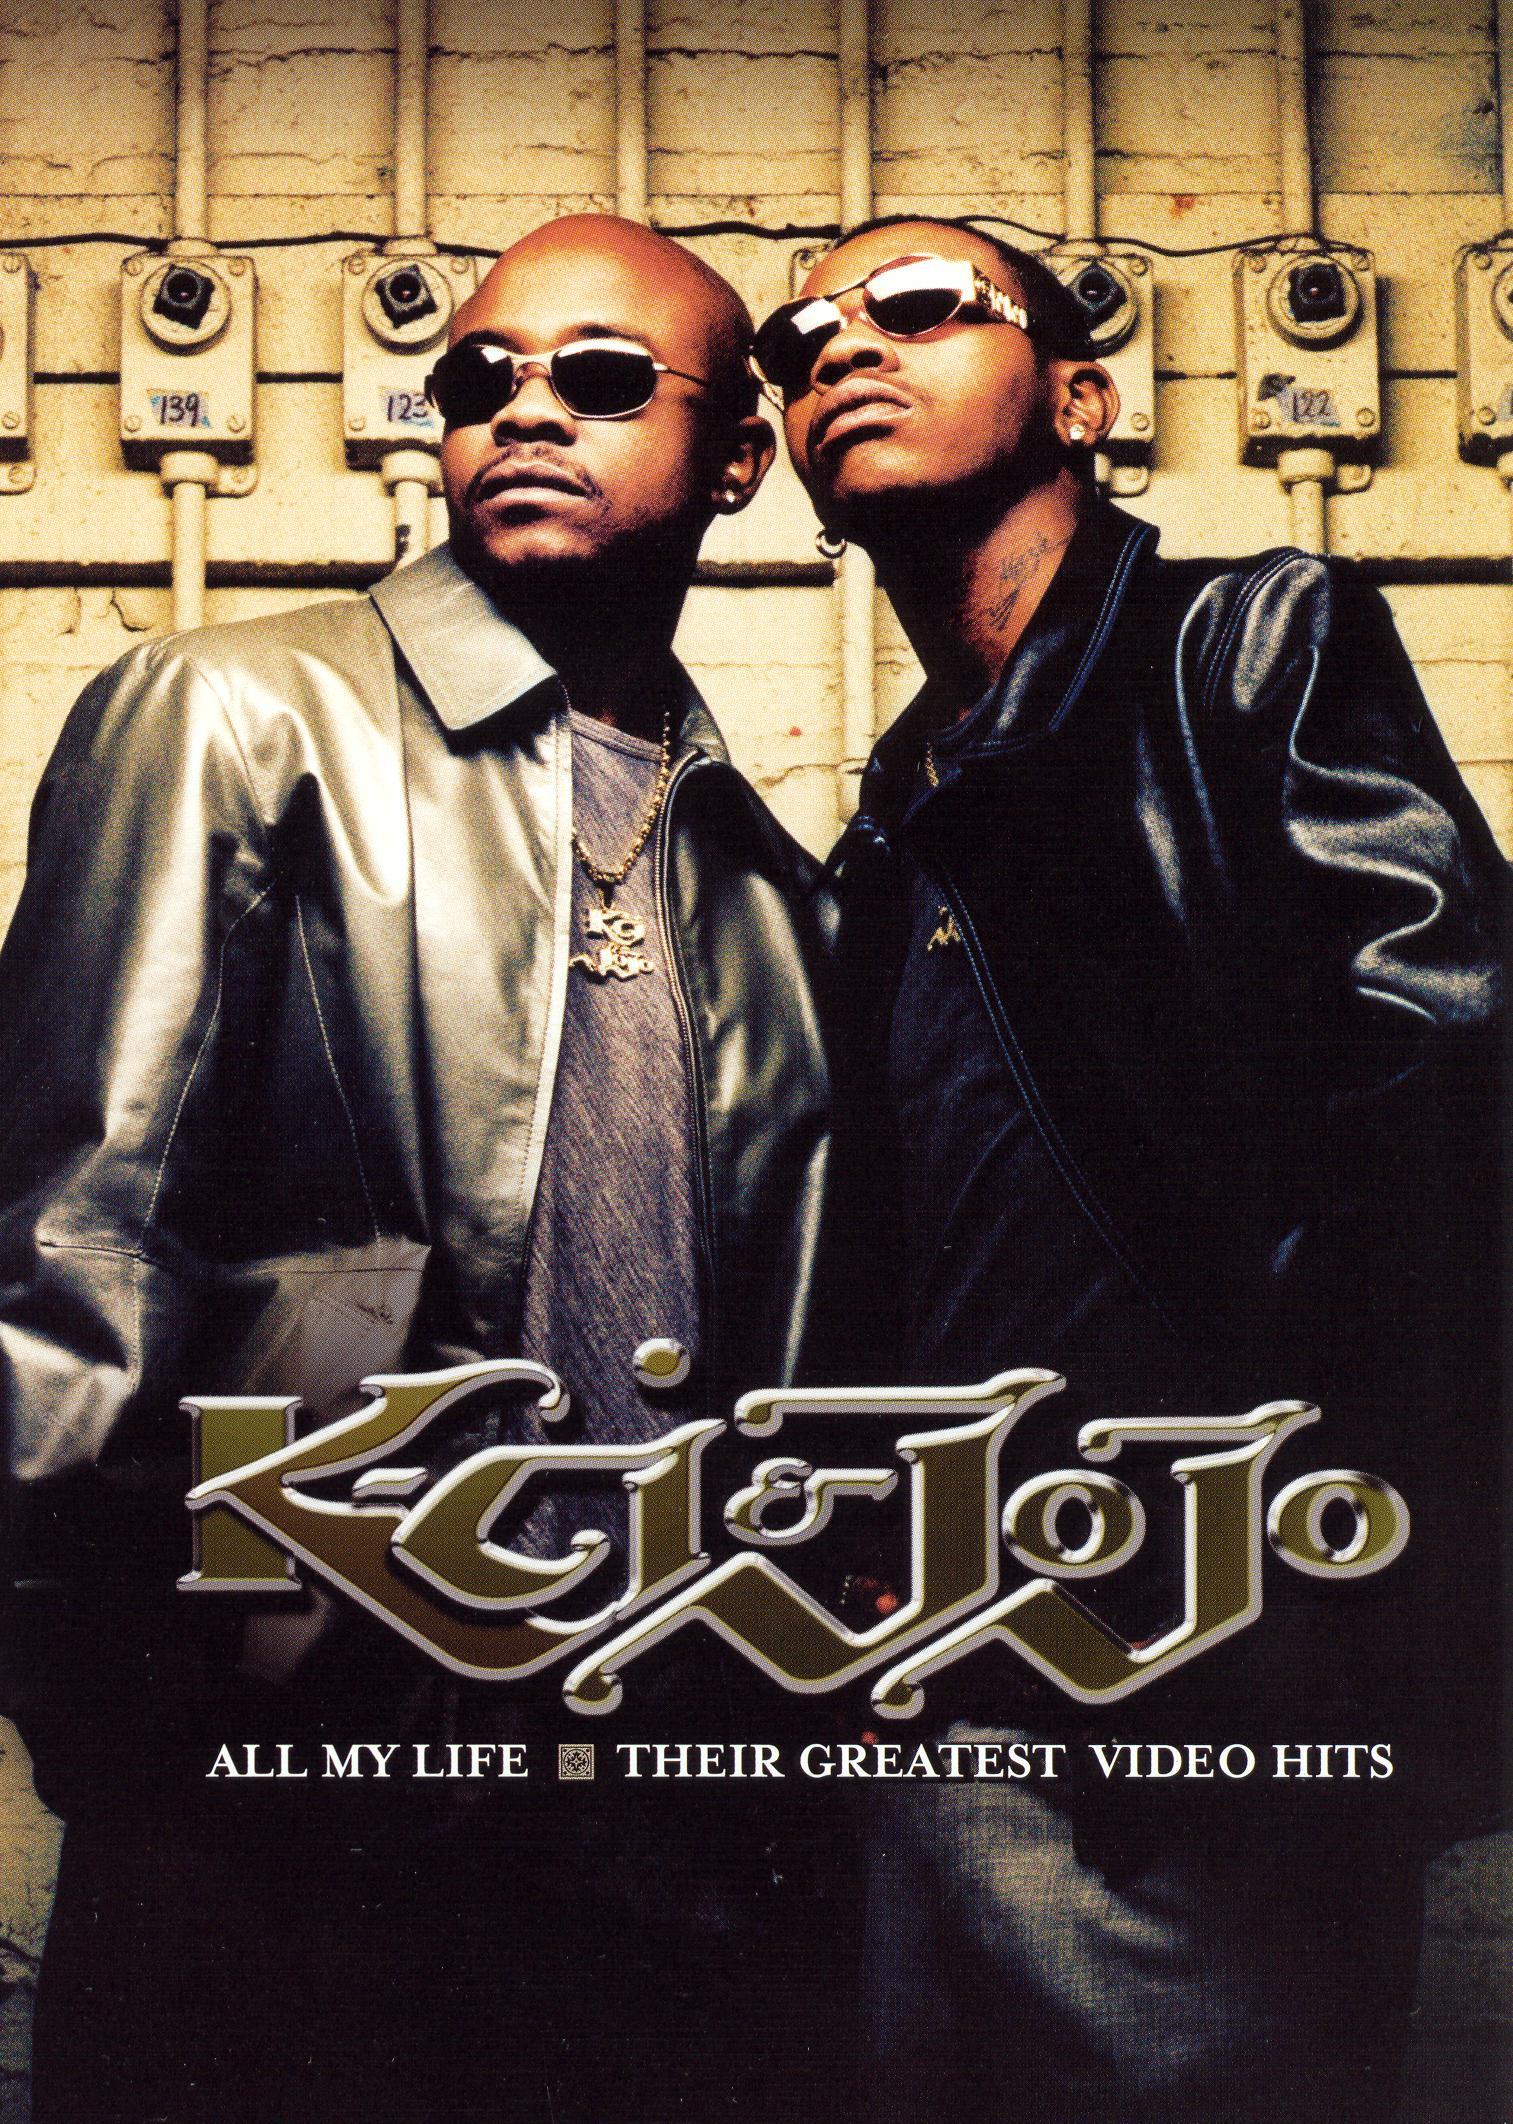 K-Ci & Jojo: All My Life - Their Greatest Hits